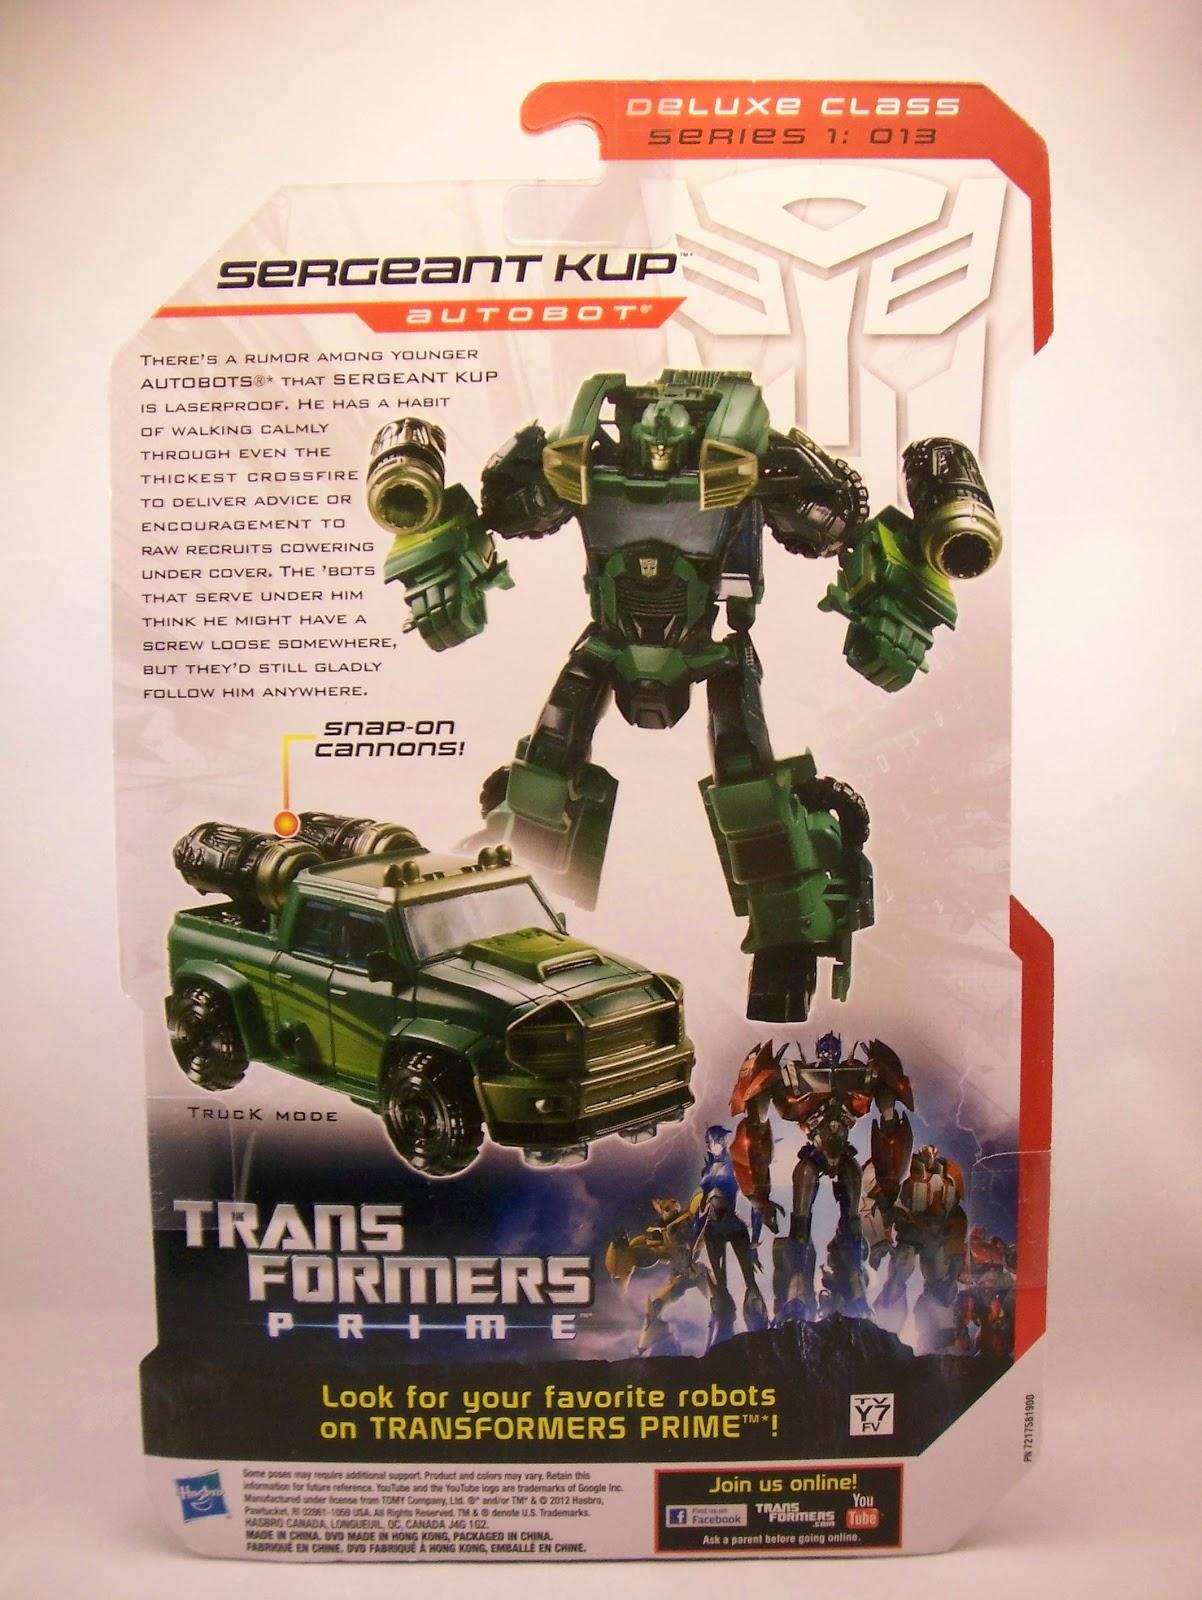 http://4.bp.blogspot.com/-HwrL-GHPyXM/UHww6PiBkZI/AAAAAAAADN0/SVnHGvT5fAY/s1600/Hasbro+Transformers+Prime+Seargeant+Kup+Ironhide+Repaint+(1).JPG